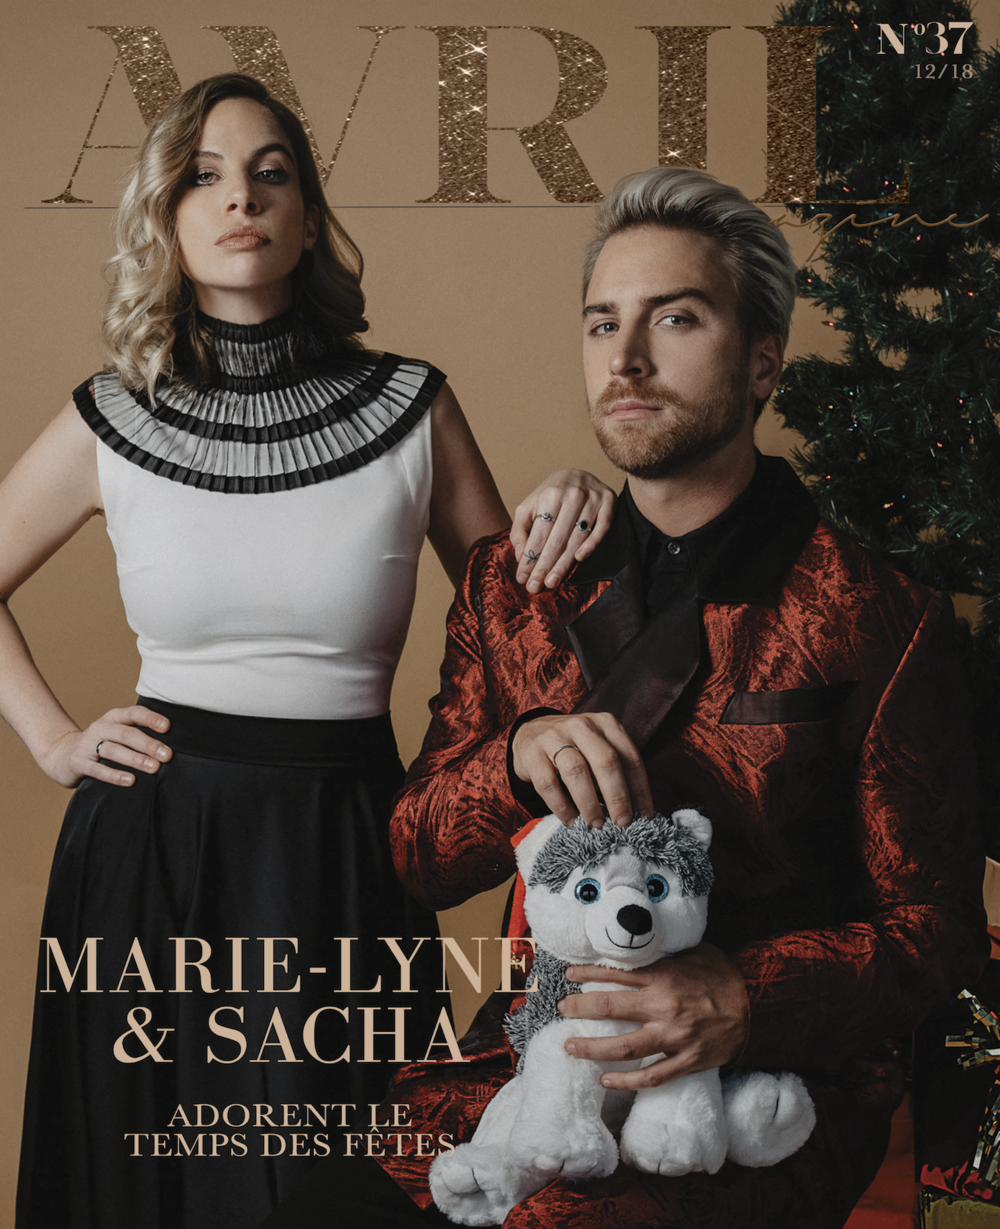 Cover_marielyne-sacha_Avril Magazine_dec2018.jpg